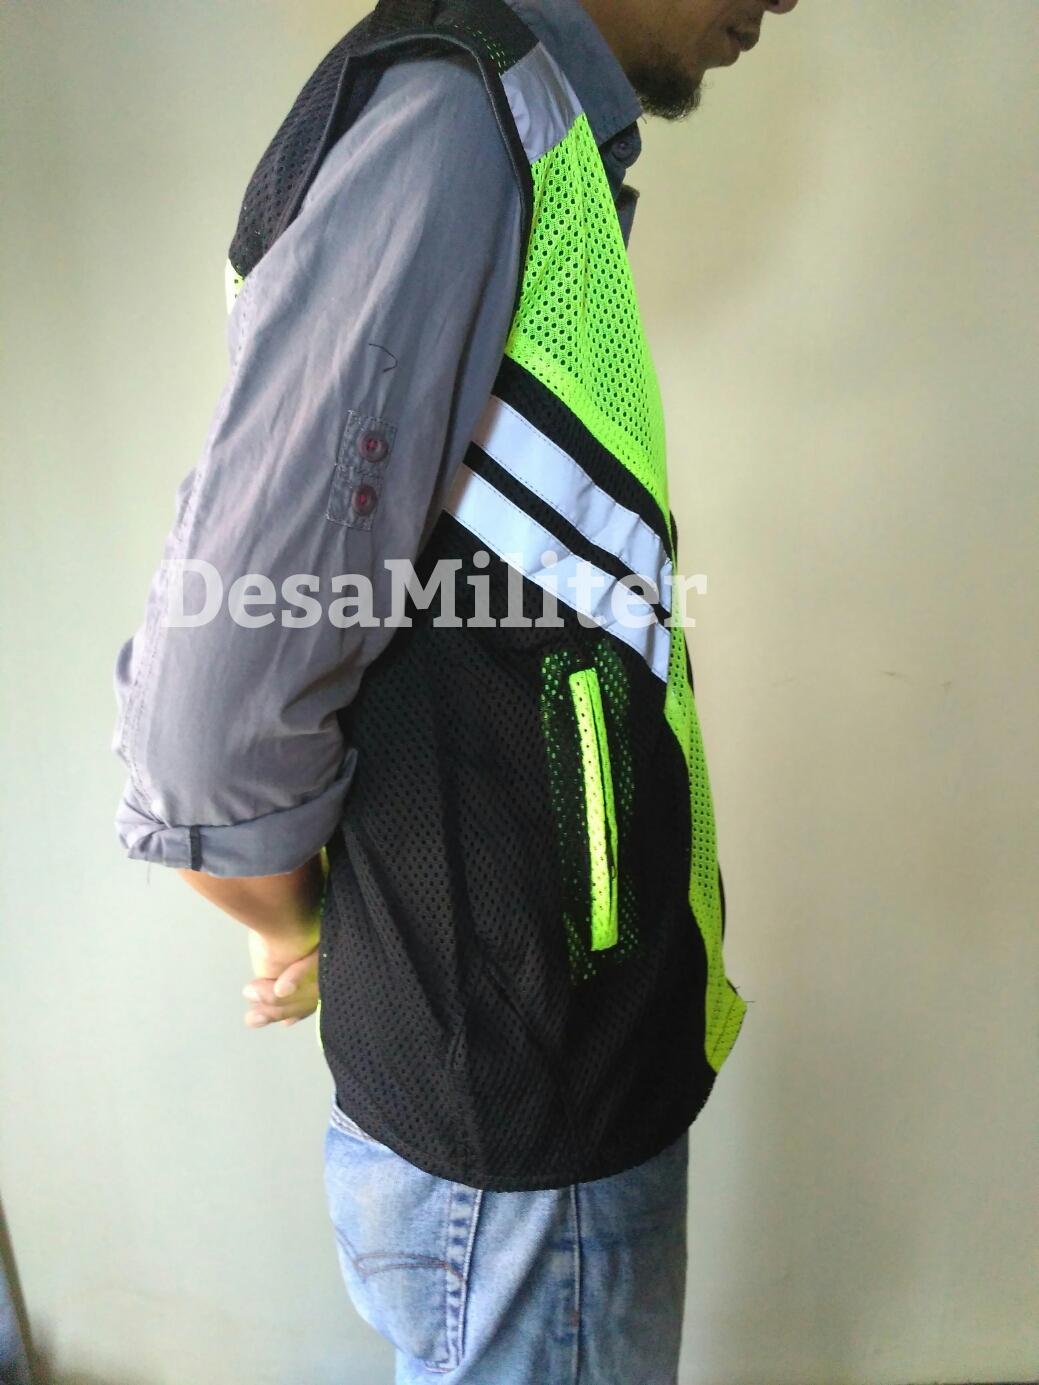 Gambar Produk Rinci Rompi Satpam - Rompi Security - Gada Pratama - Gada  Madya Terkini 95138cac14